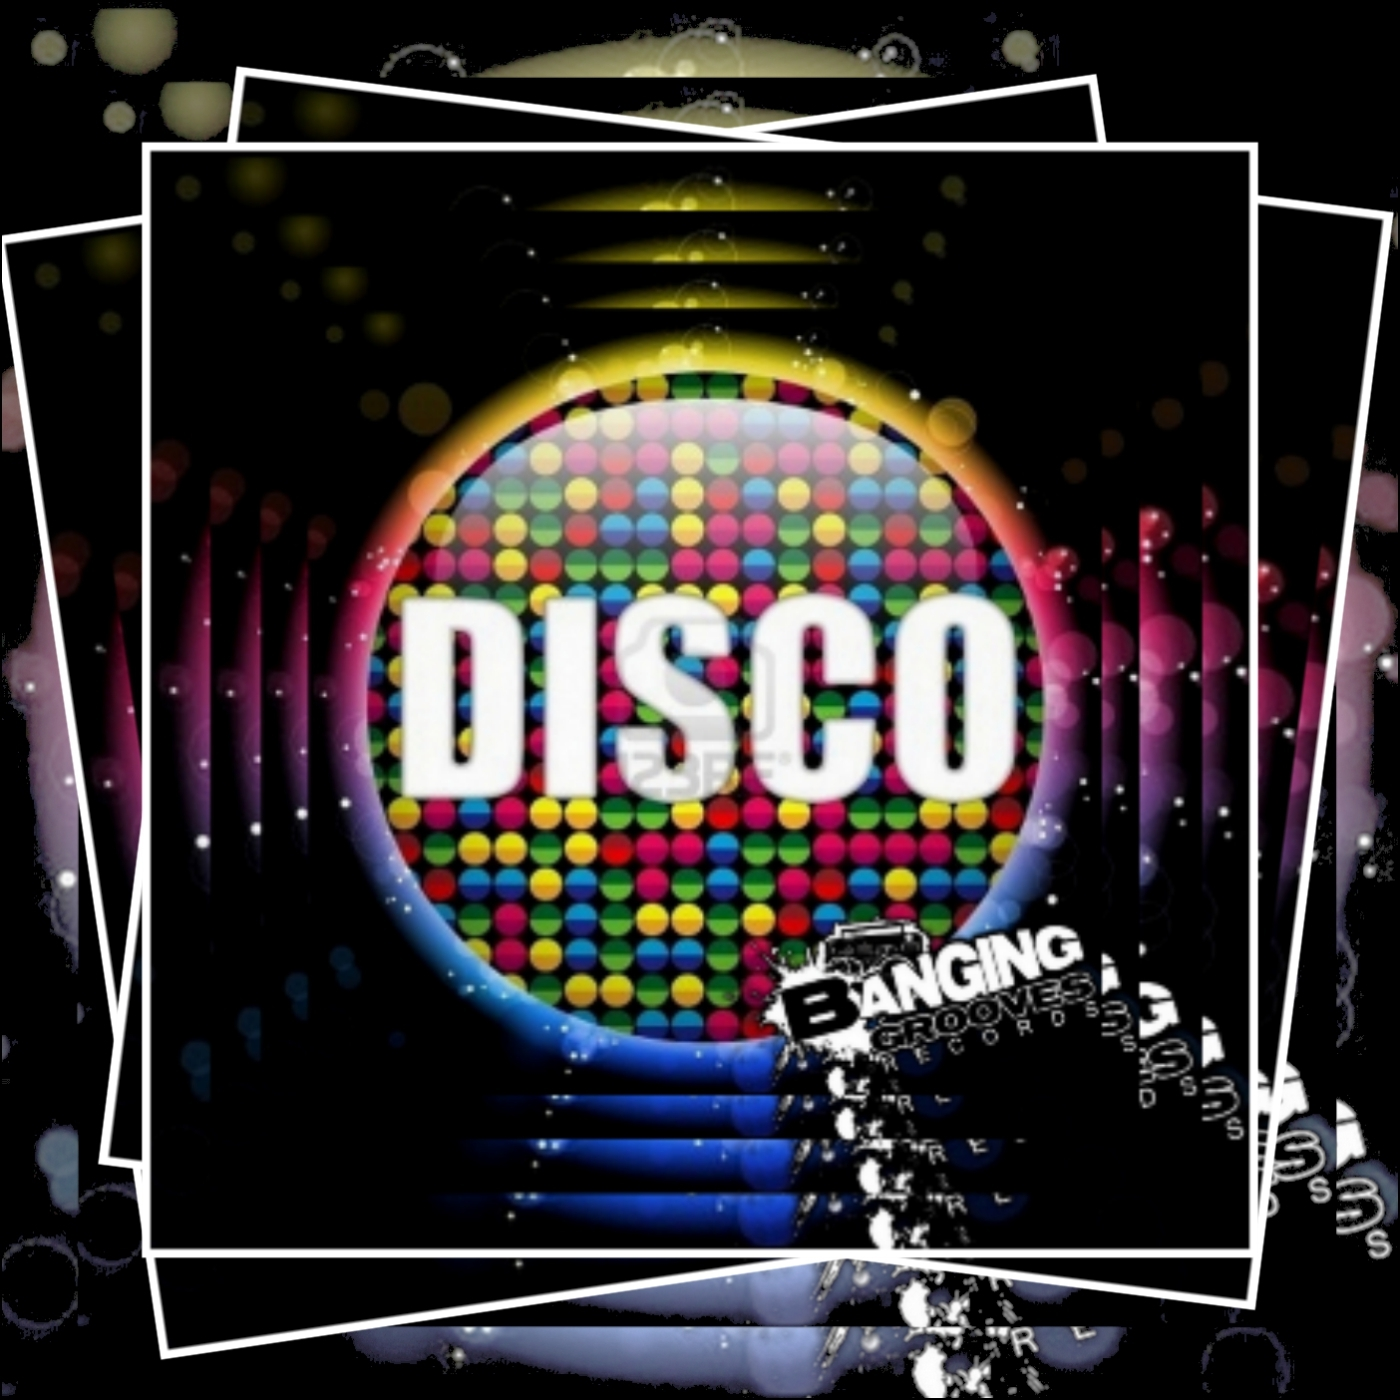 DJ Funsko - Falling Disco Star (Original mix)